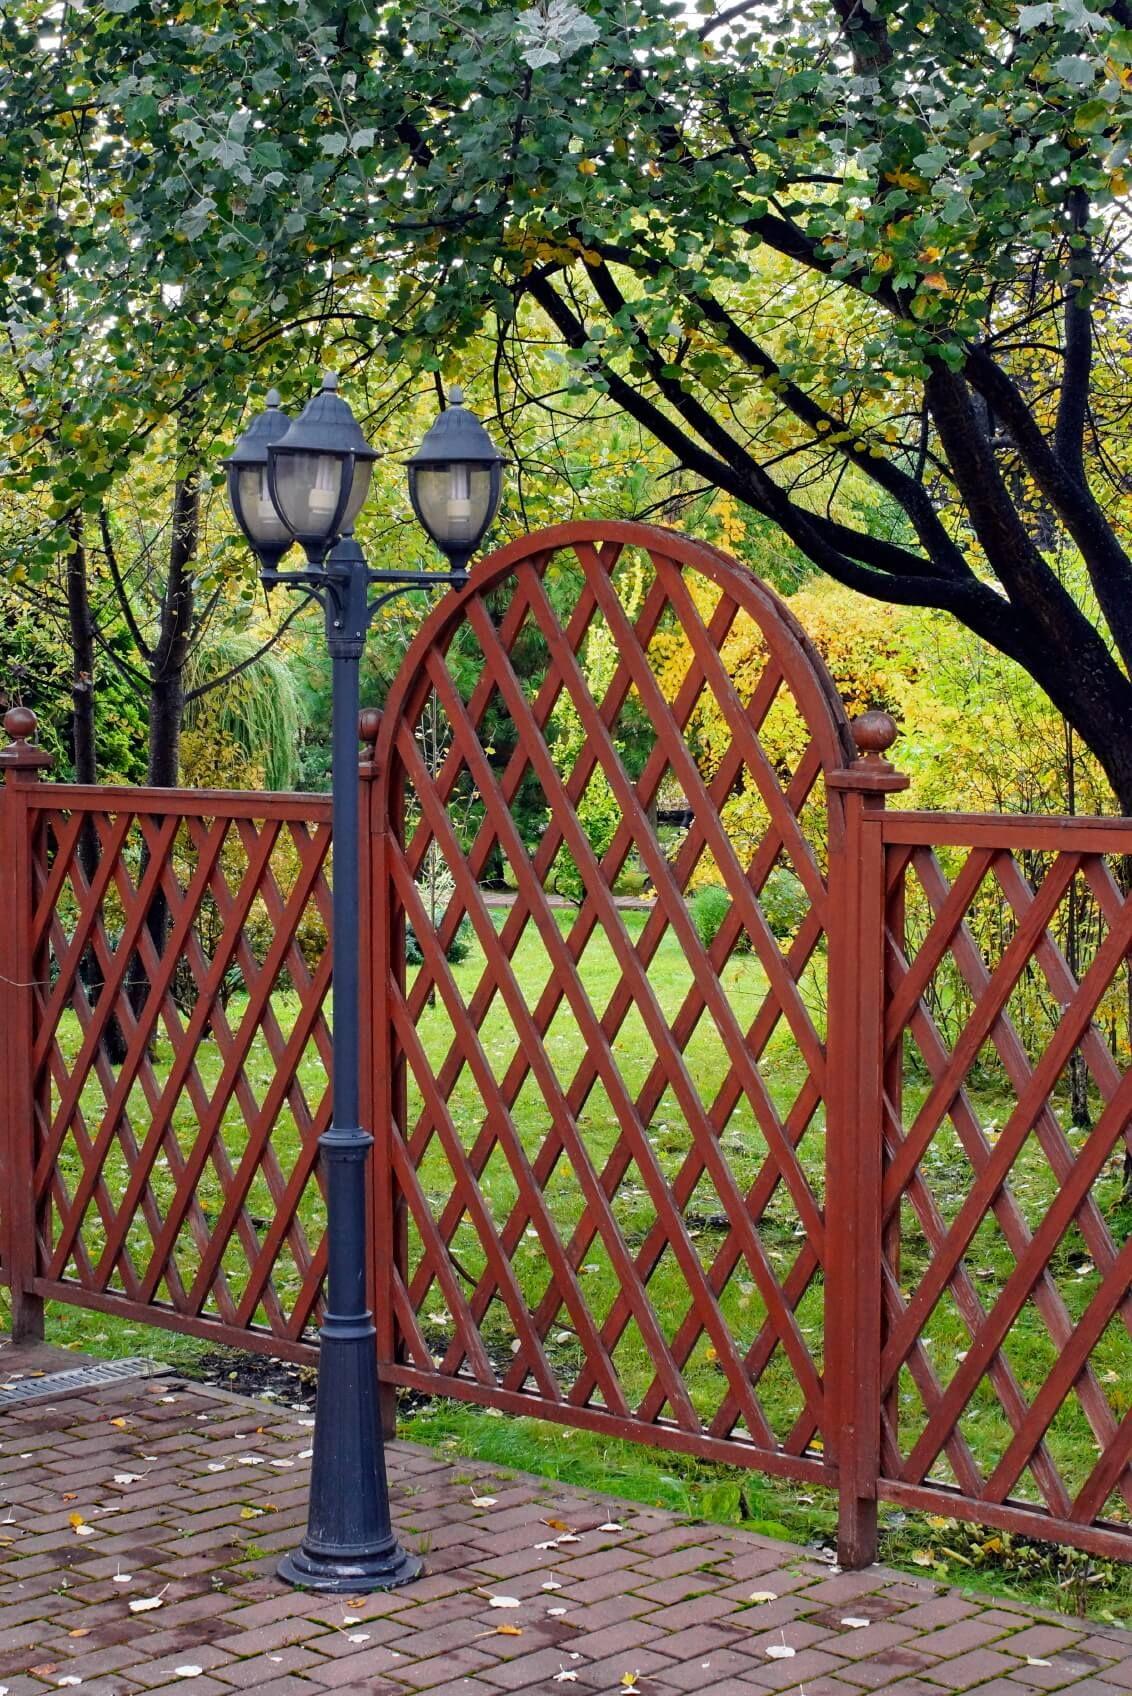 22 Creative Lattice Fence Ideas for Gardens and Backyards | Lattice ...